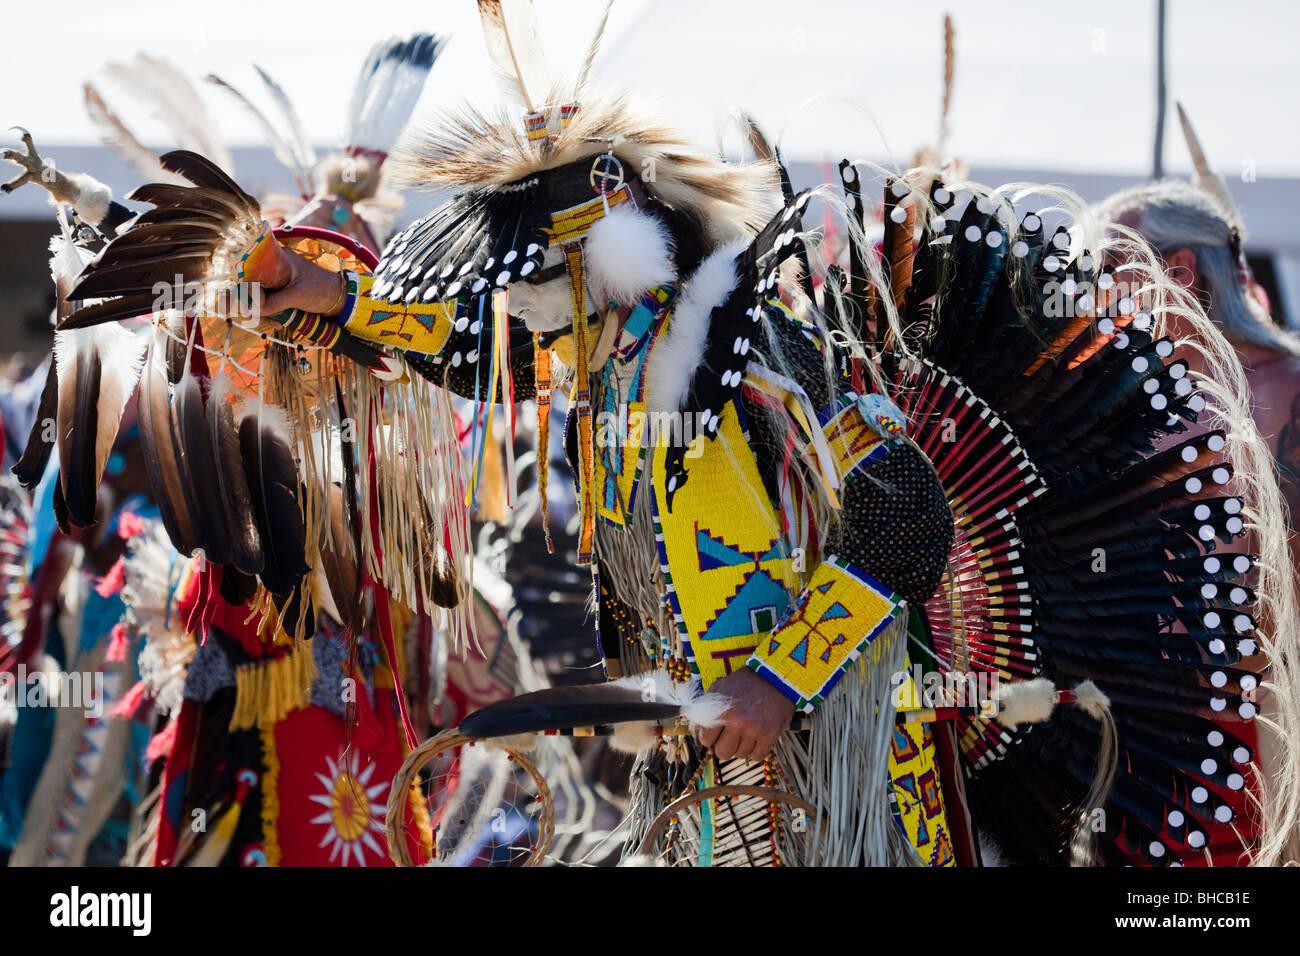 Indian ceremony - Stock Image